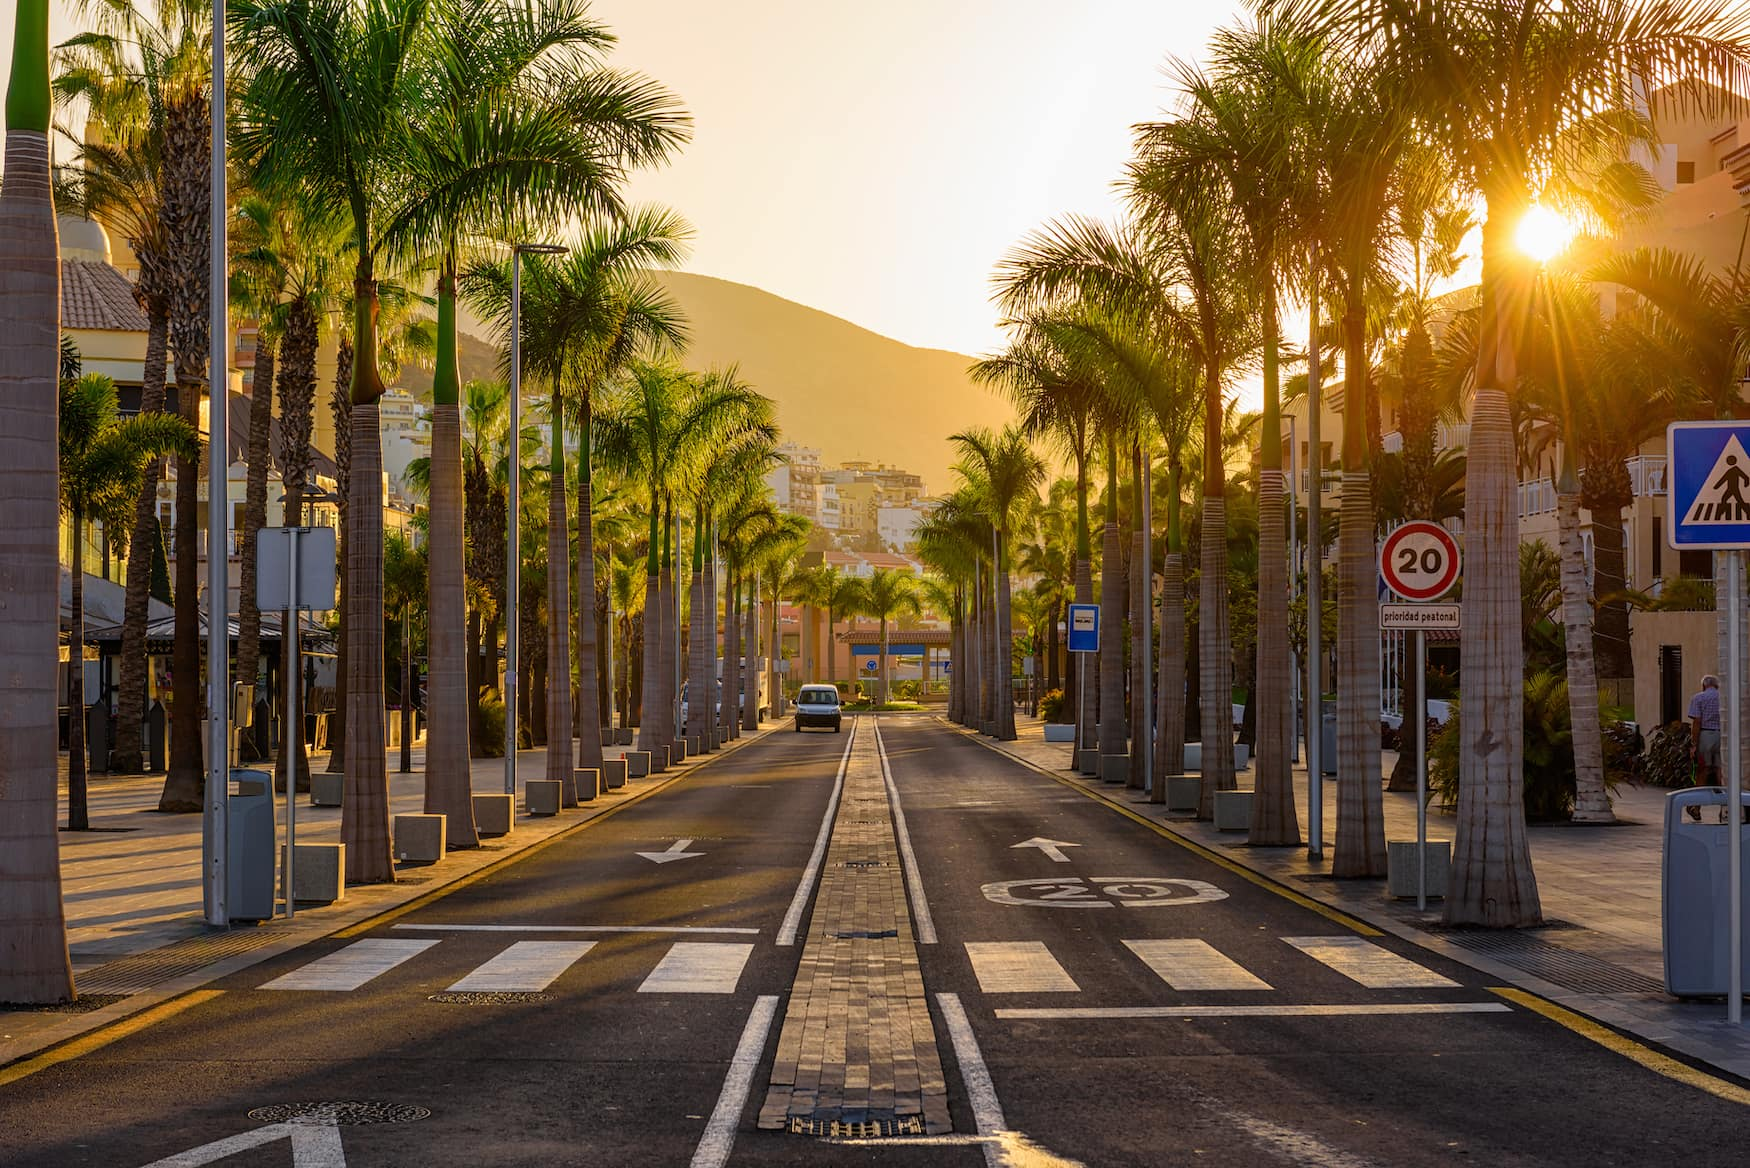 Avenida de Las Americas auf der Kanareninsel Teneriffa